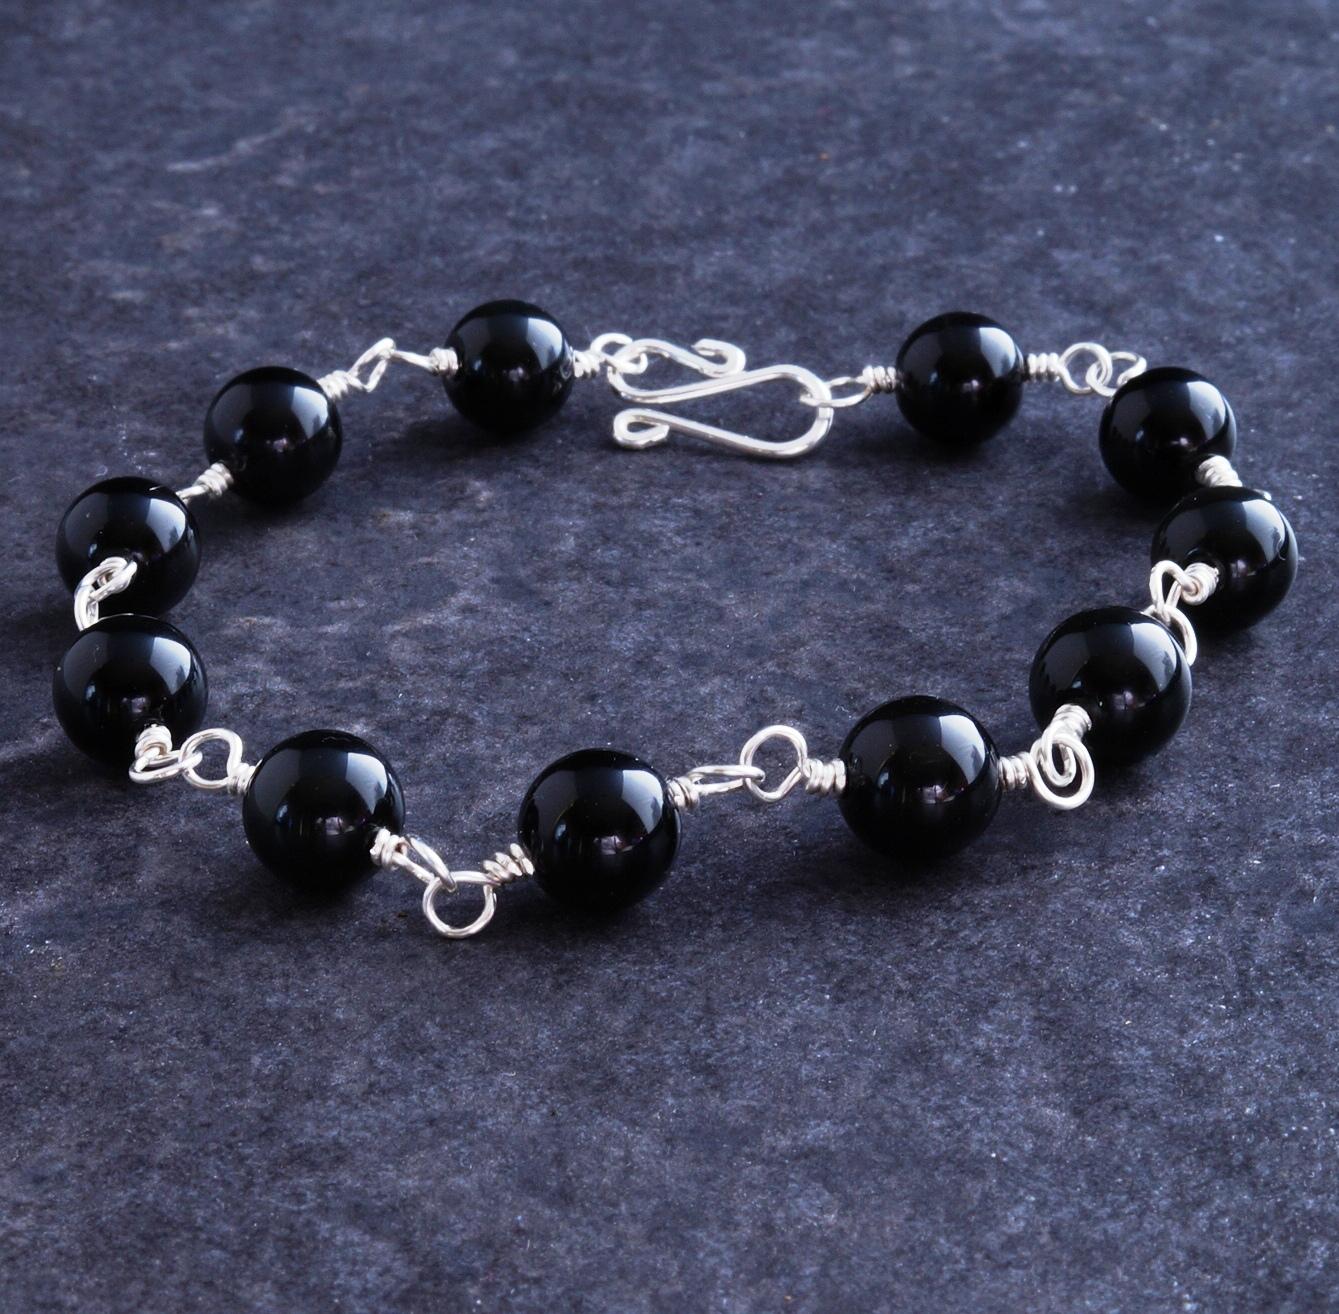 Handmade Sterling Silver Rainbow Obsidian Bracelet